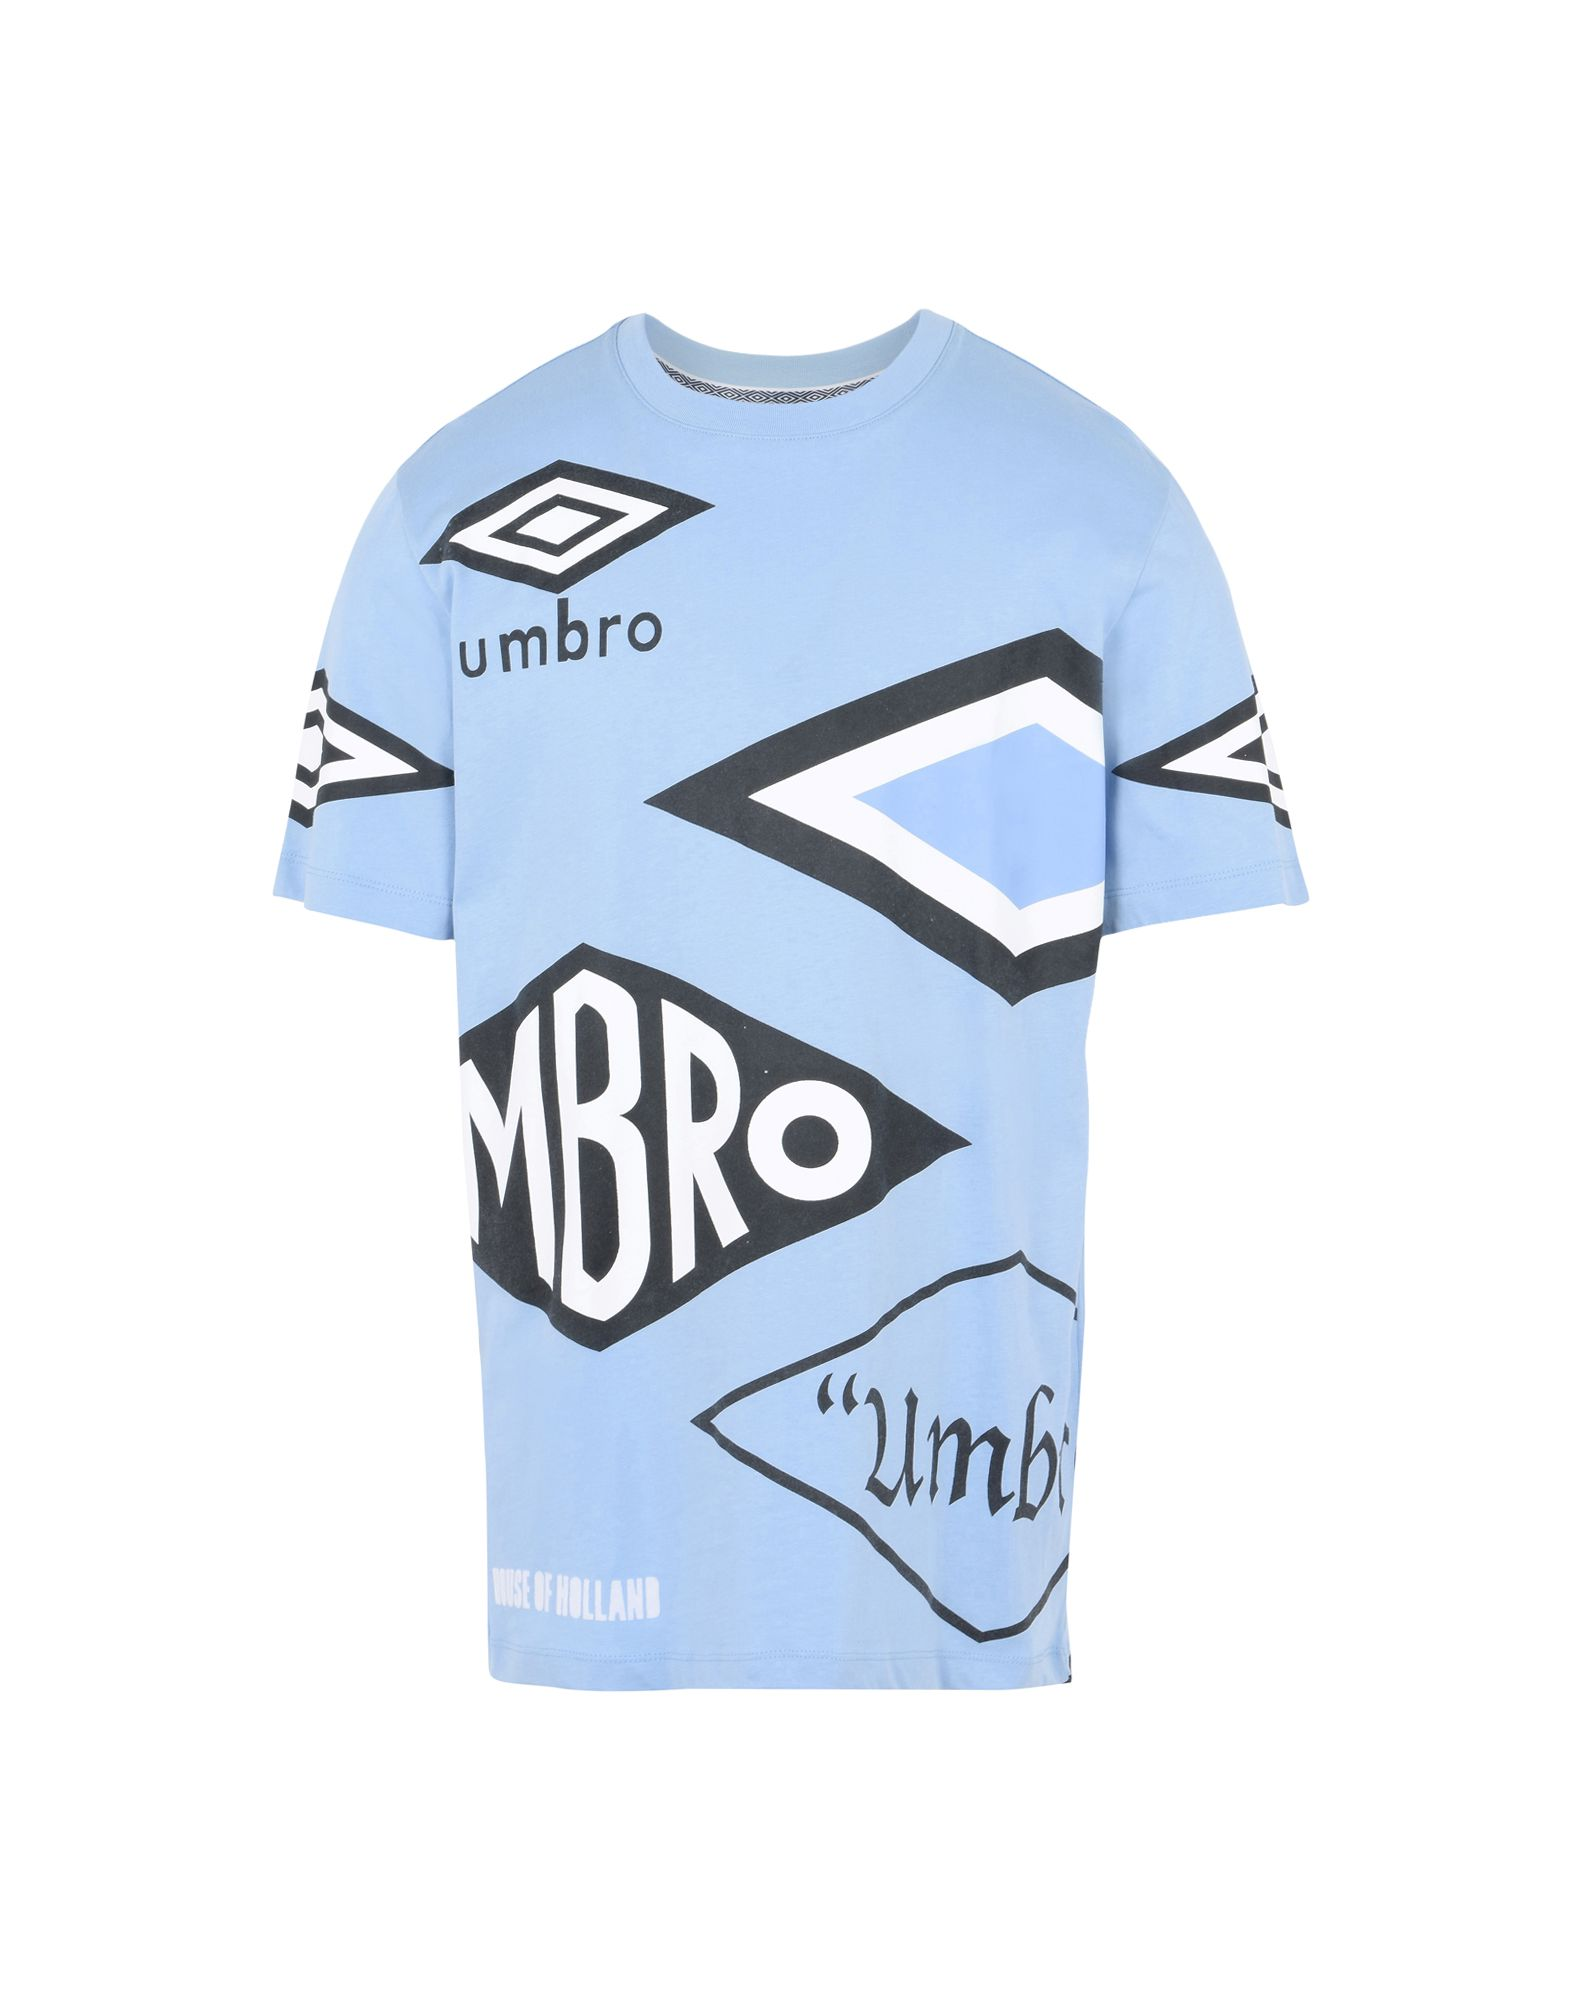 umbro sports t shirts